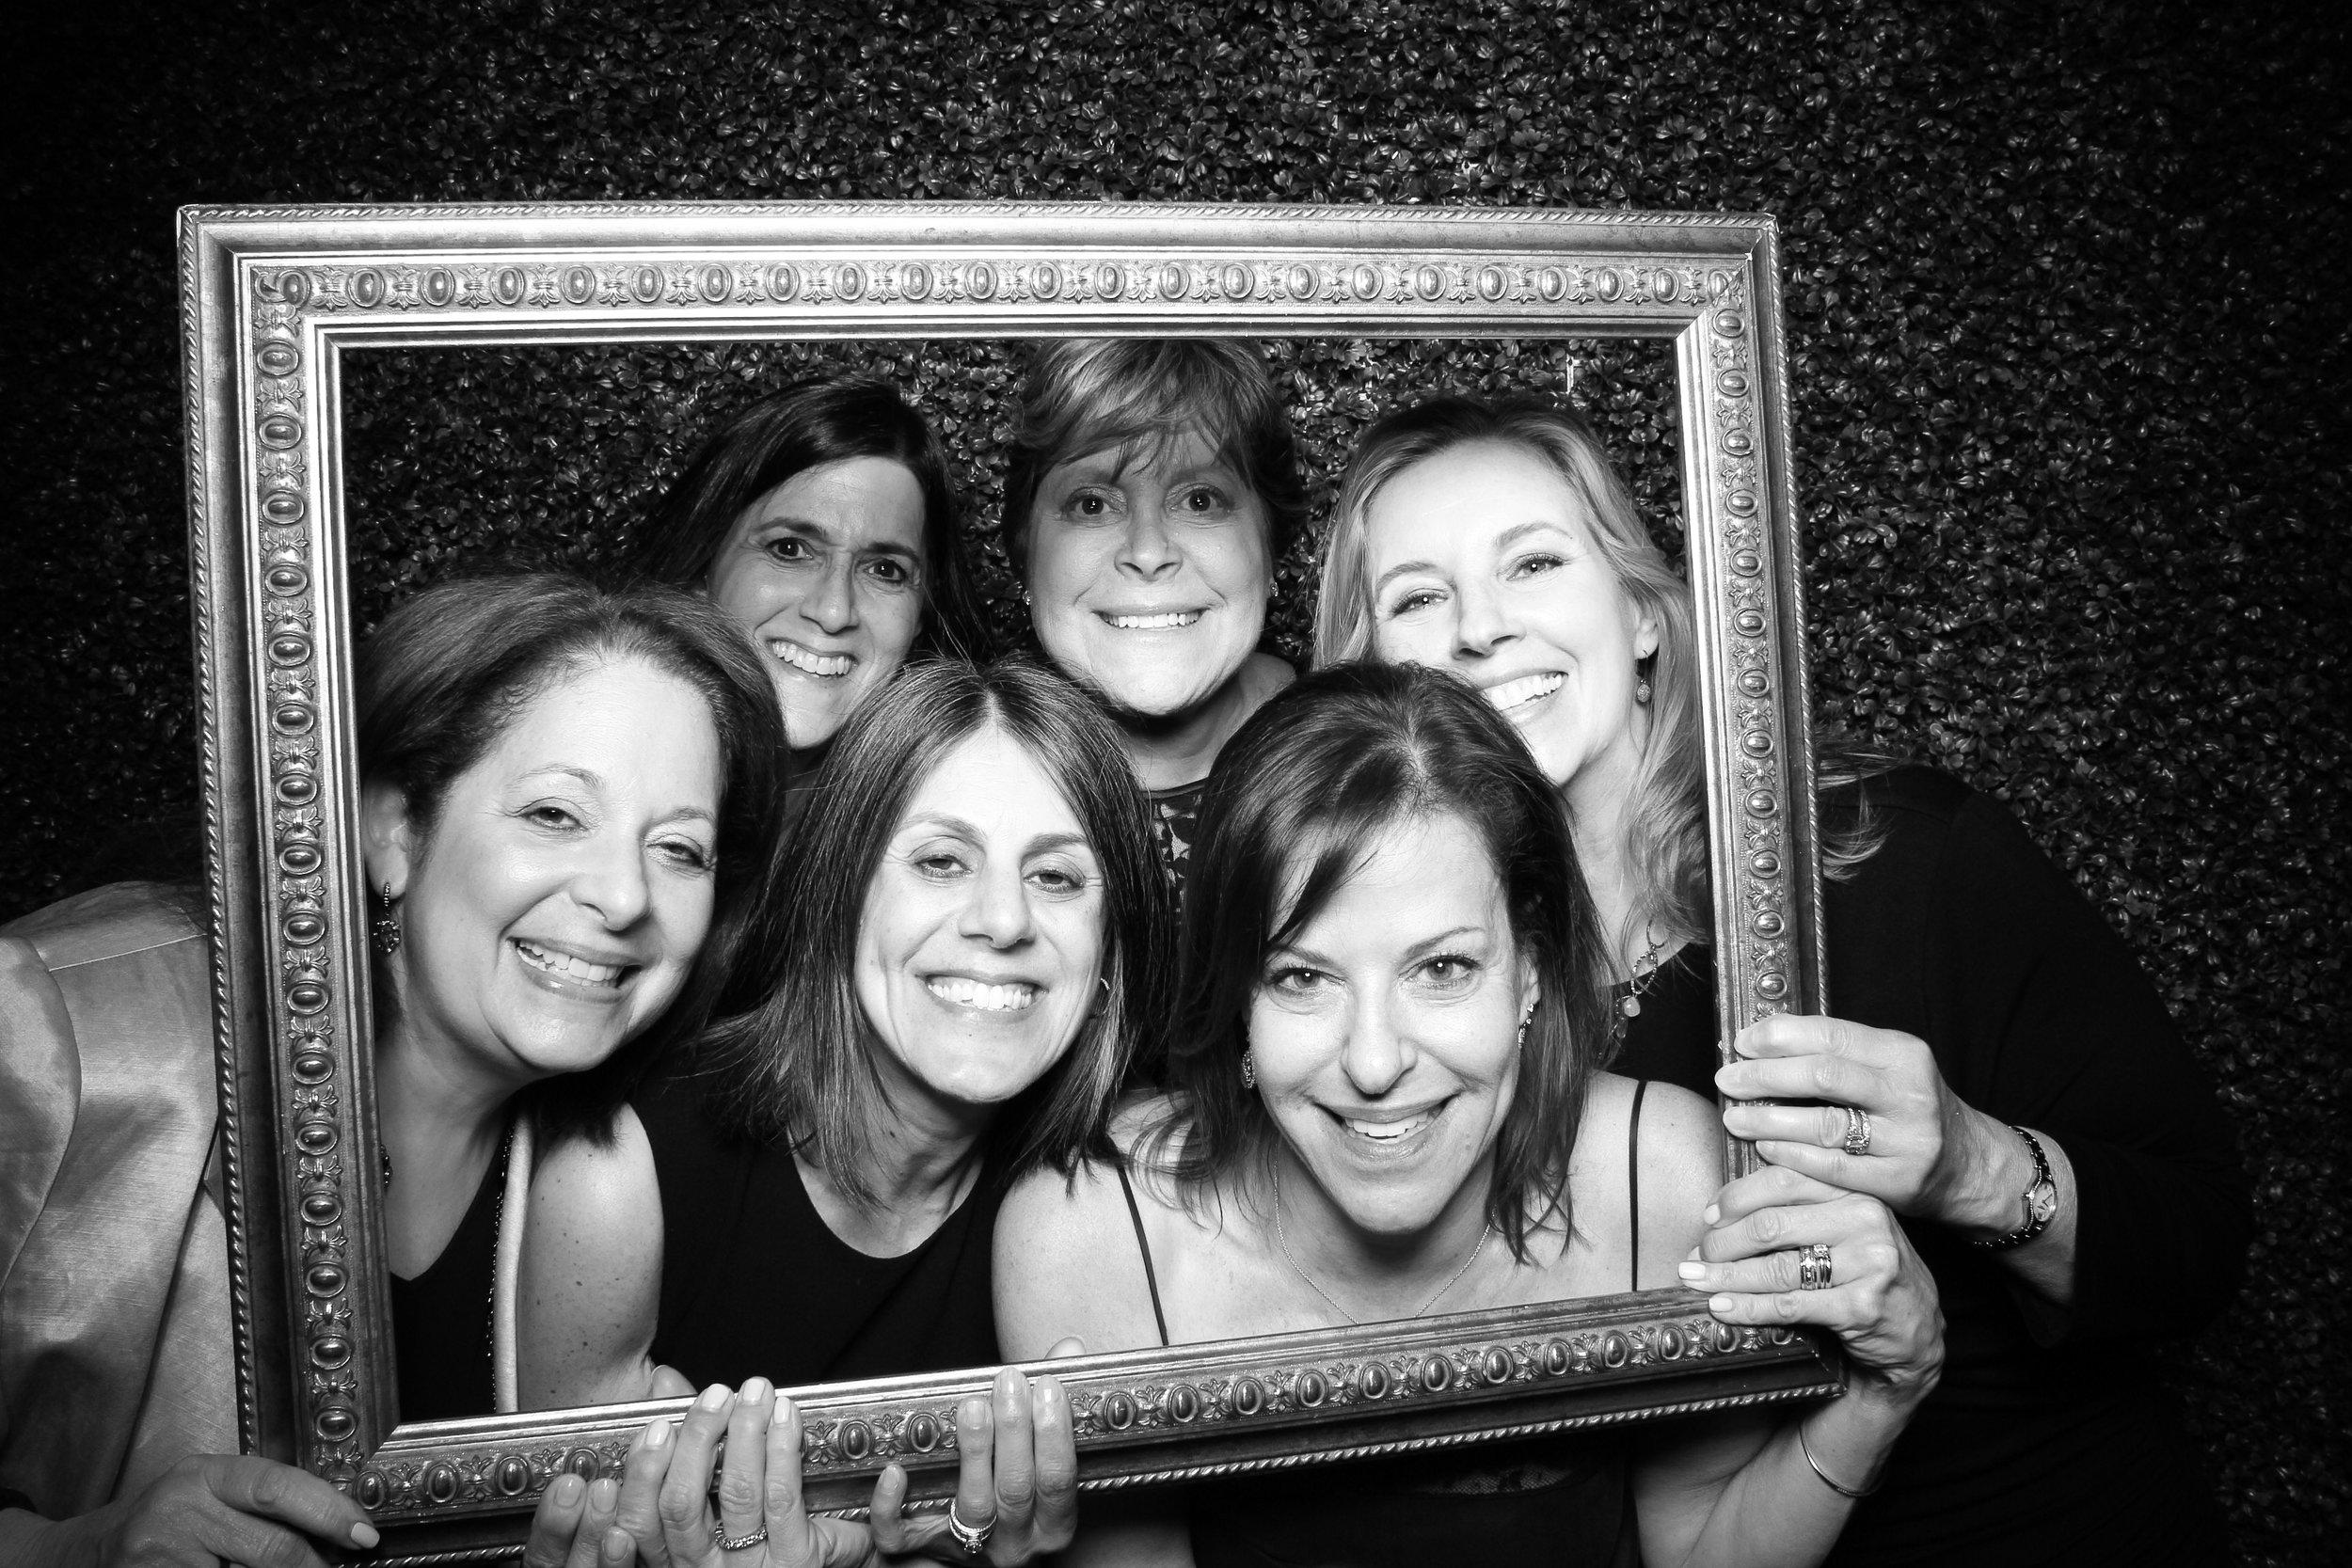 Ivy_Room_Chicago_Wedding_Reception_Photo_Booth_Rental__08.jpg